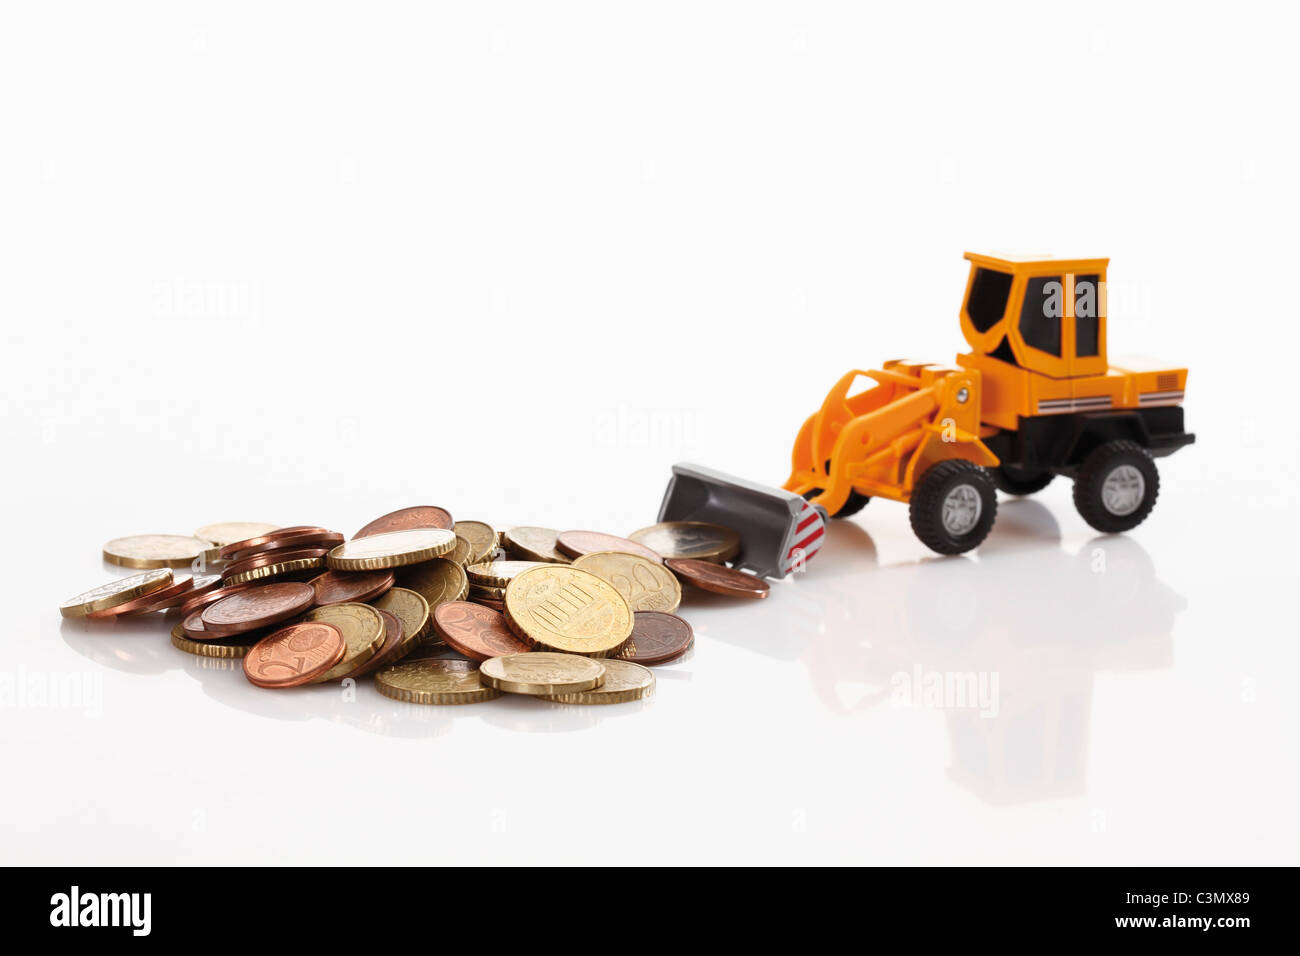 Toy bulldozer with euro coins on white background - Stock Image